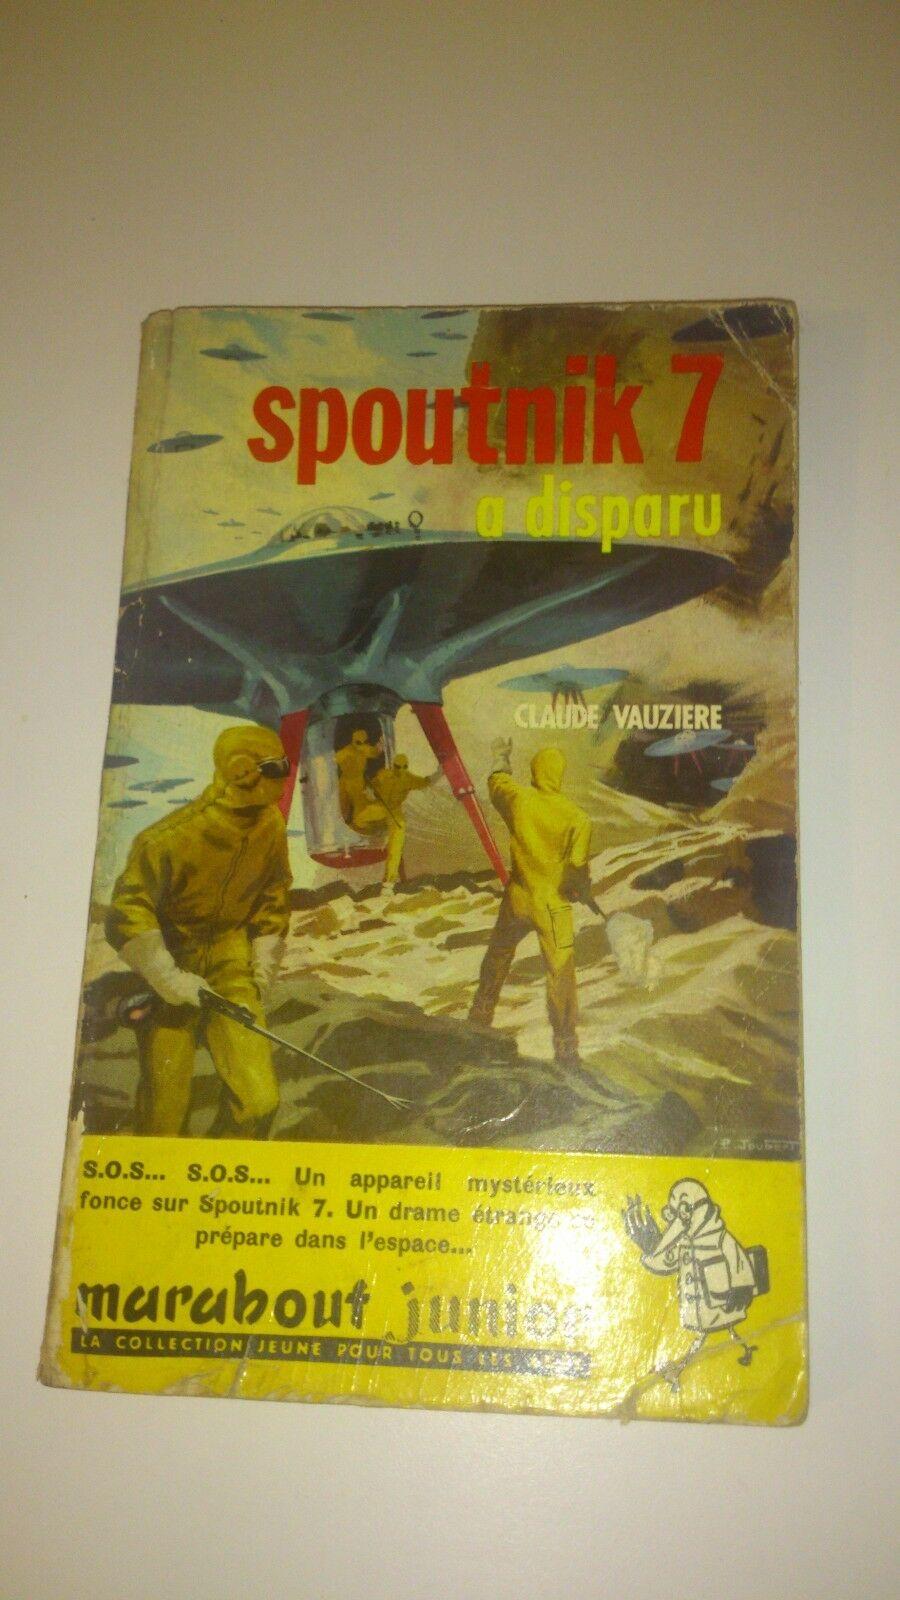 Spunik - Spoutnik - satellite, space age, design & style S-l16066